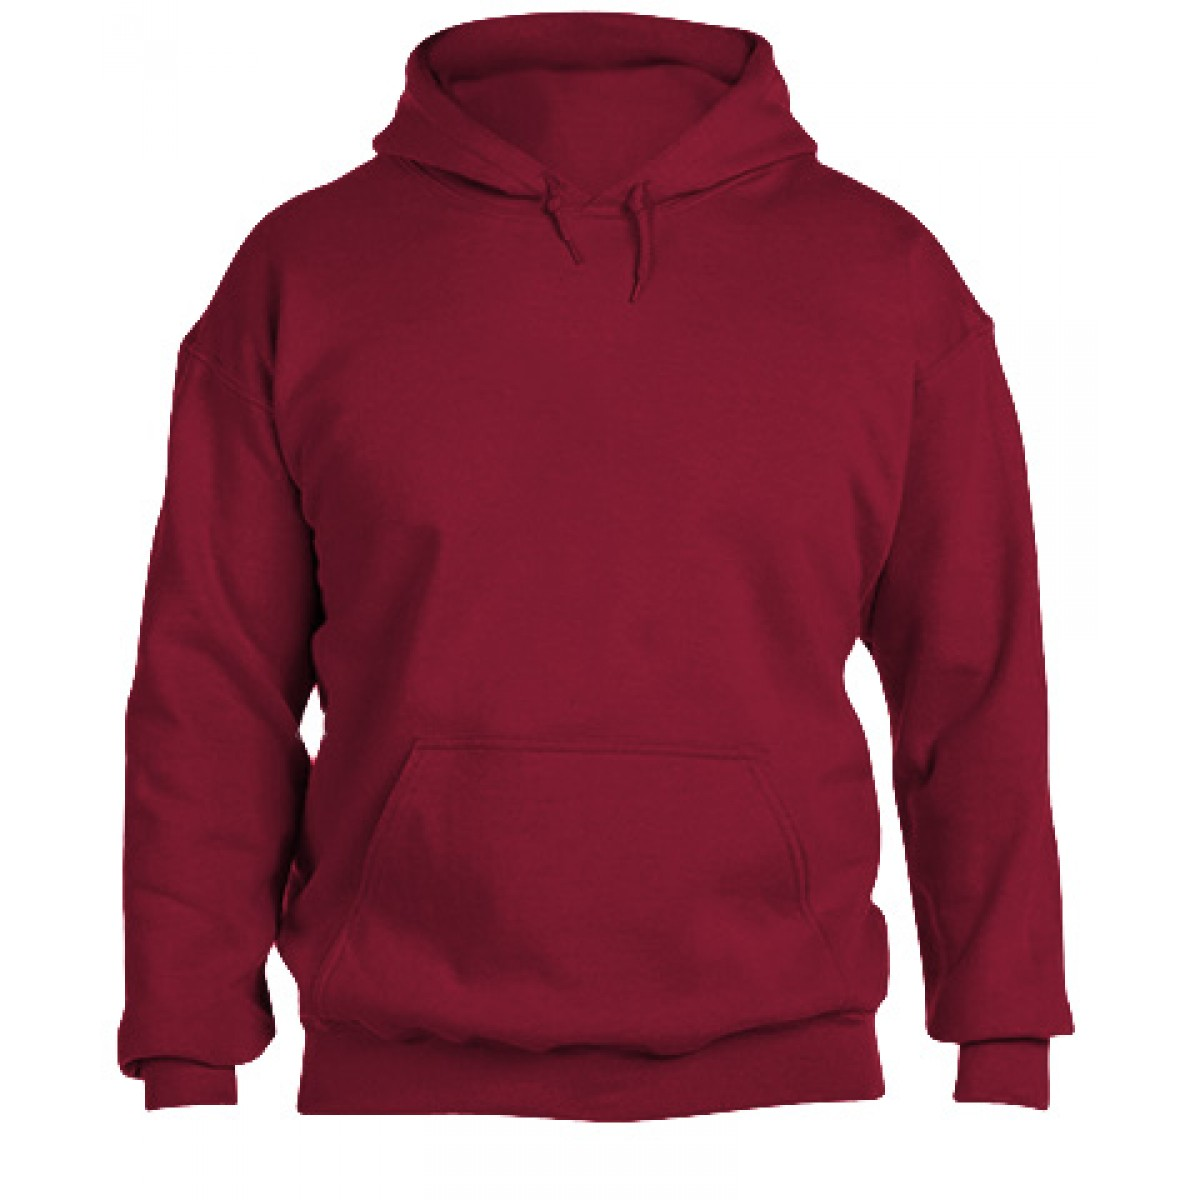 Hooded Sweatshirt 50/50 Heavy Blend -Cardinal Red-L